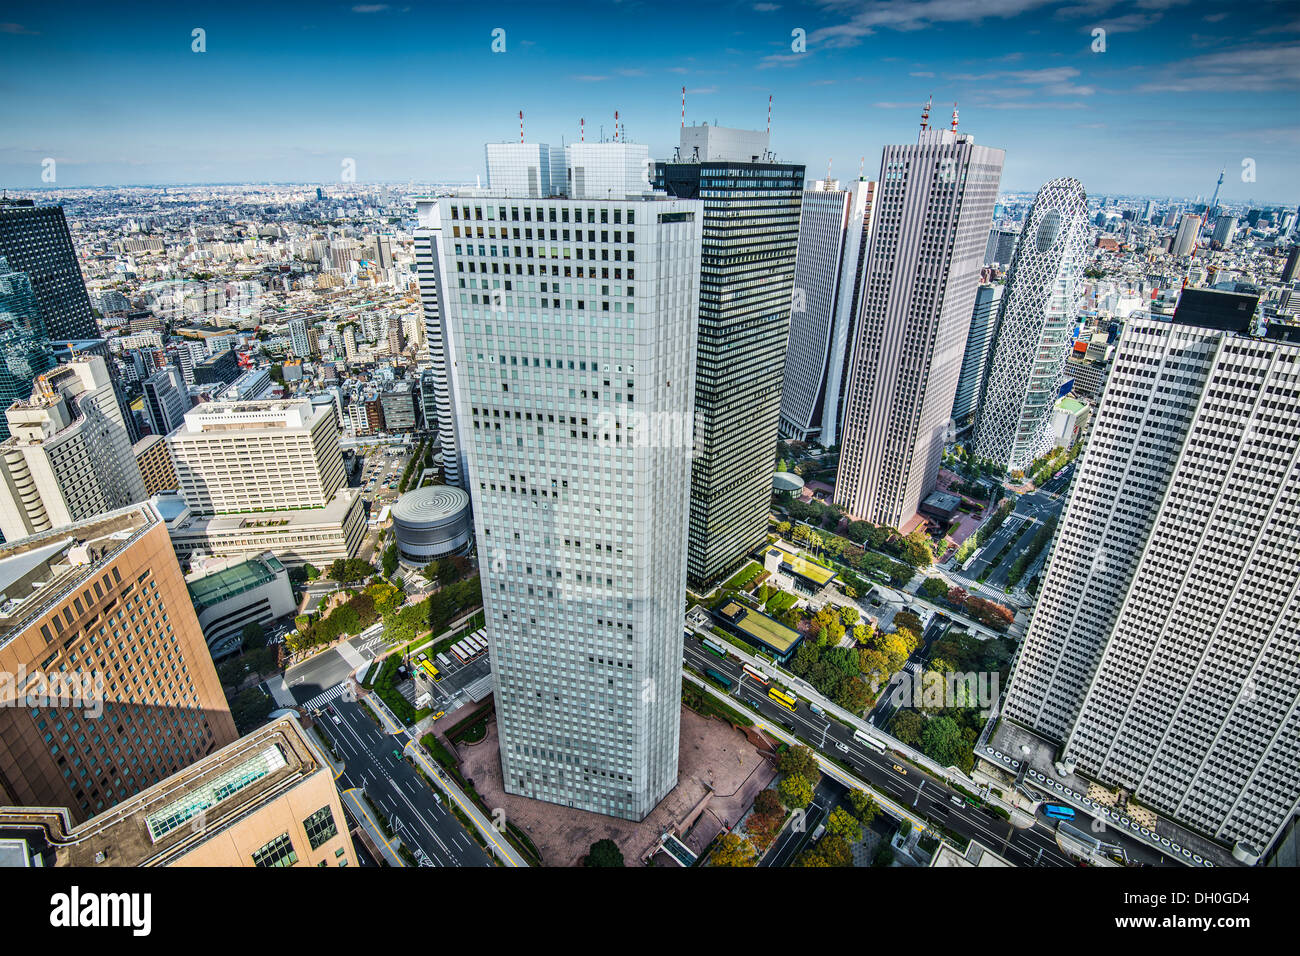 Financial buildings in Shinjuku, Tokyo, Japan. - Stock Image